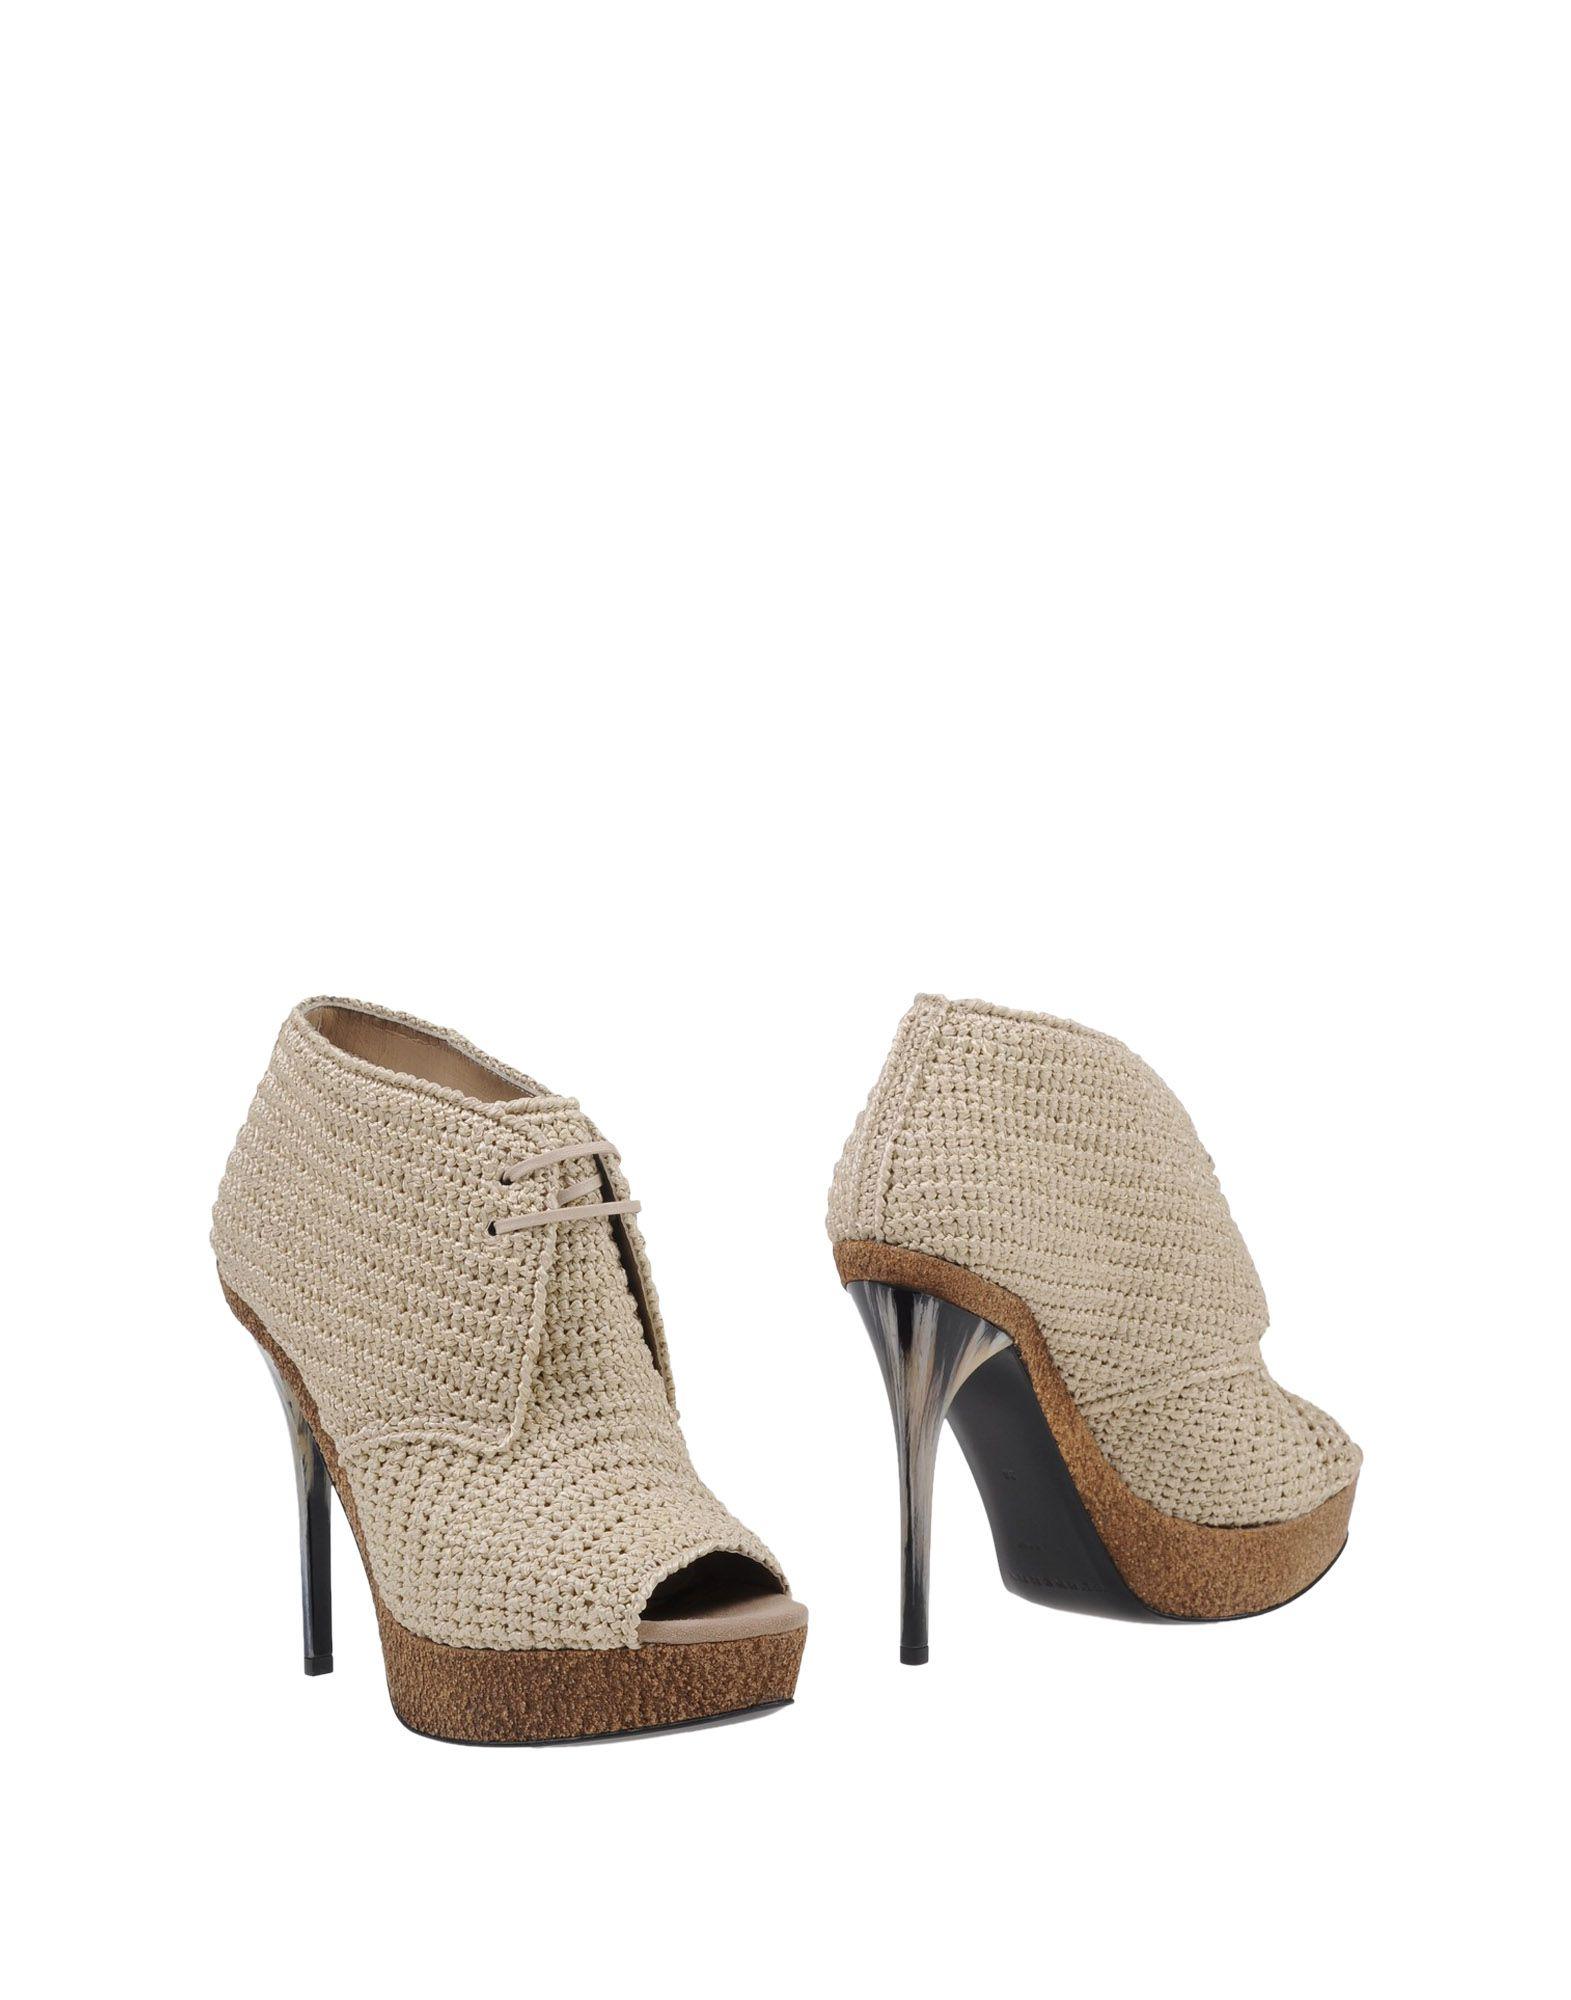 Rabatt Schuhe Burberry Stiefelette Damen  11121877EP